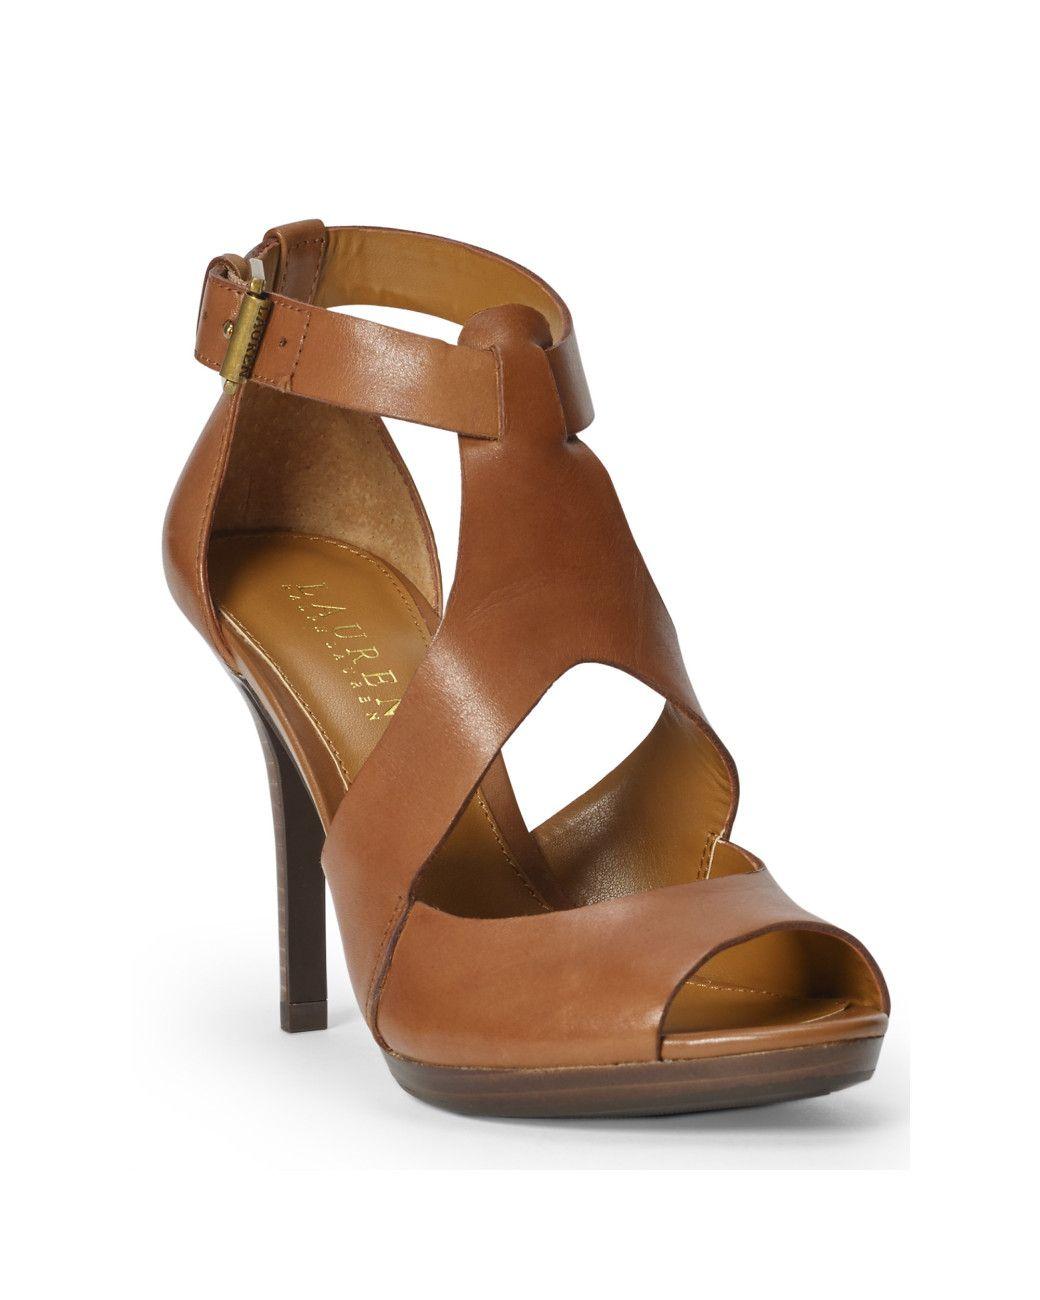 LAUREN by Ralph Lauren Womens Beth Peep Toe Ankle Strap Dorsay Black Size 7.0